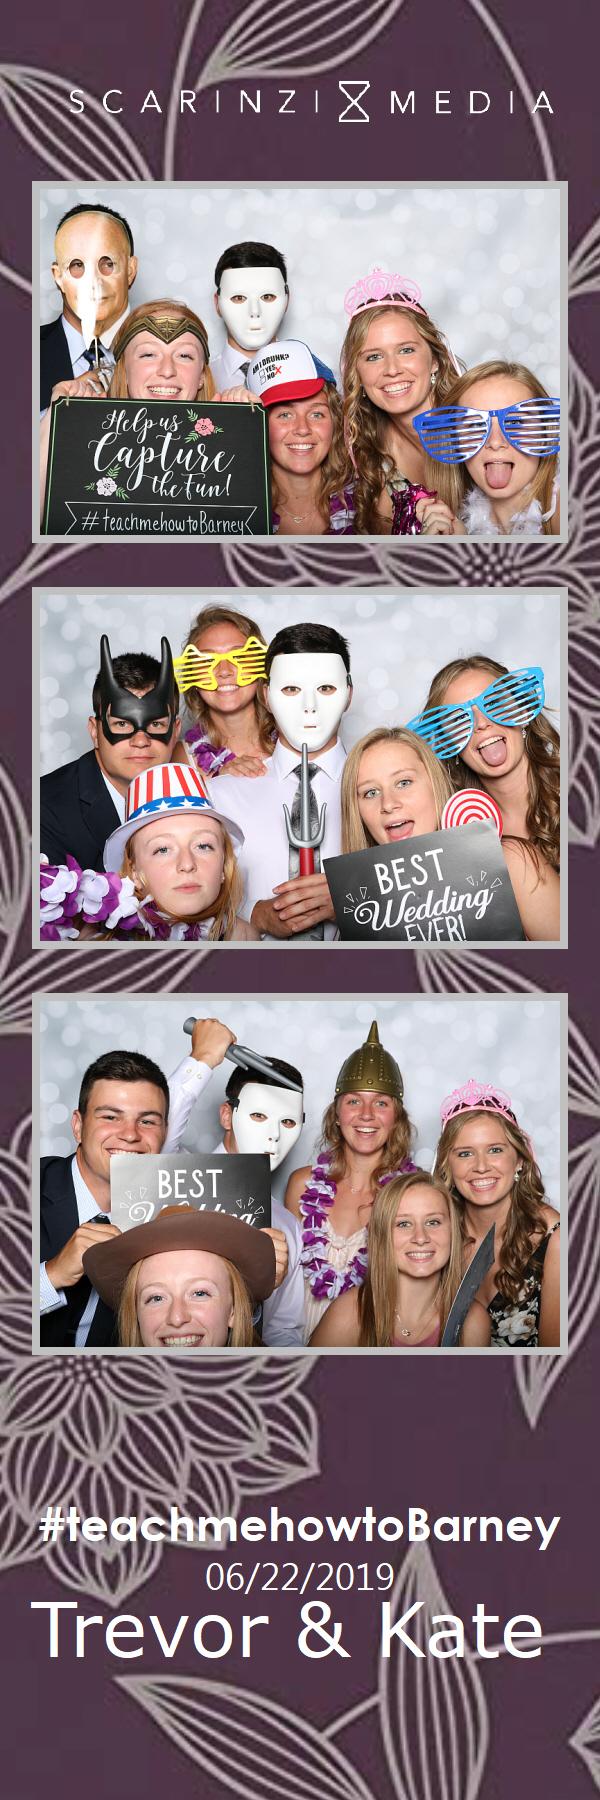 2019.06.22 - Barney Wedding PHOTOBOOTH15.jpg